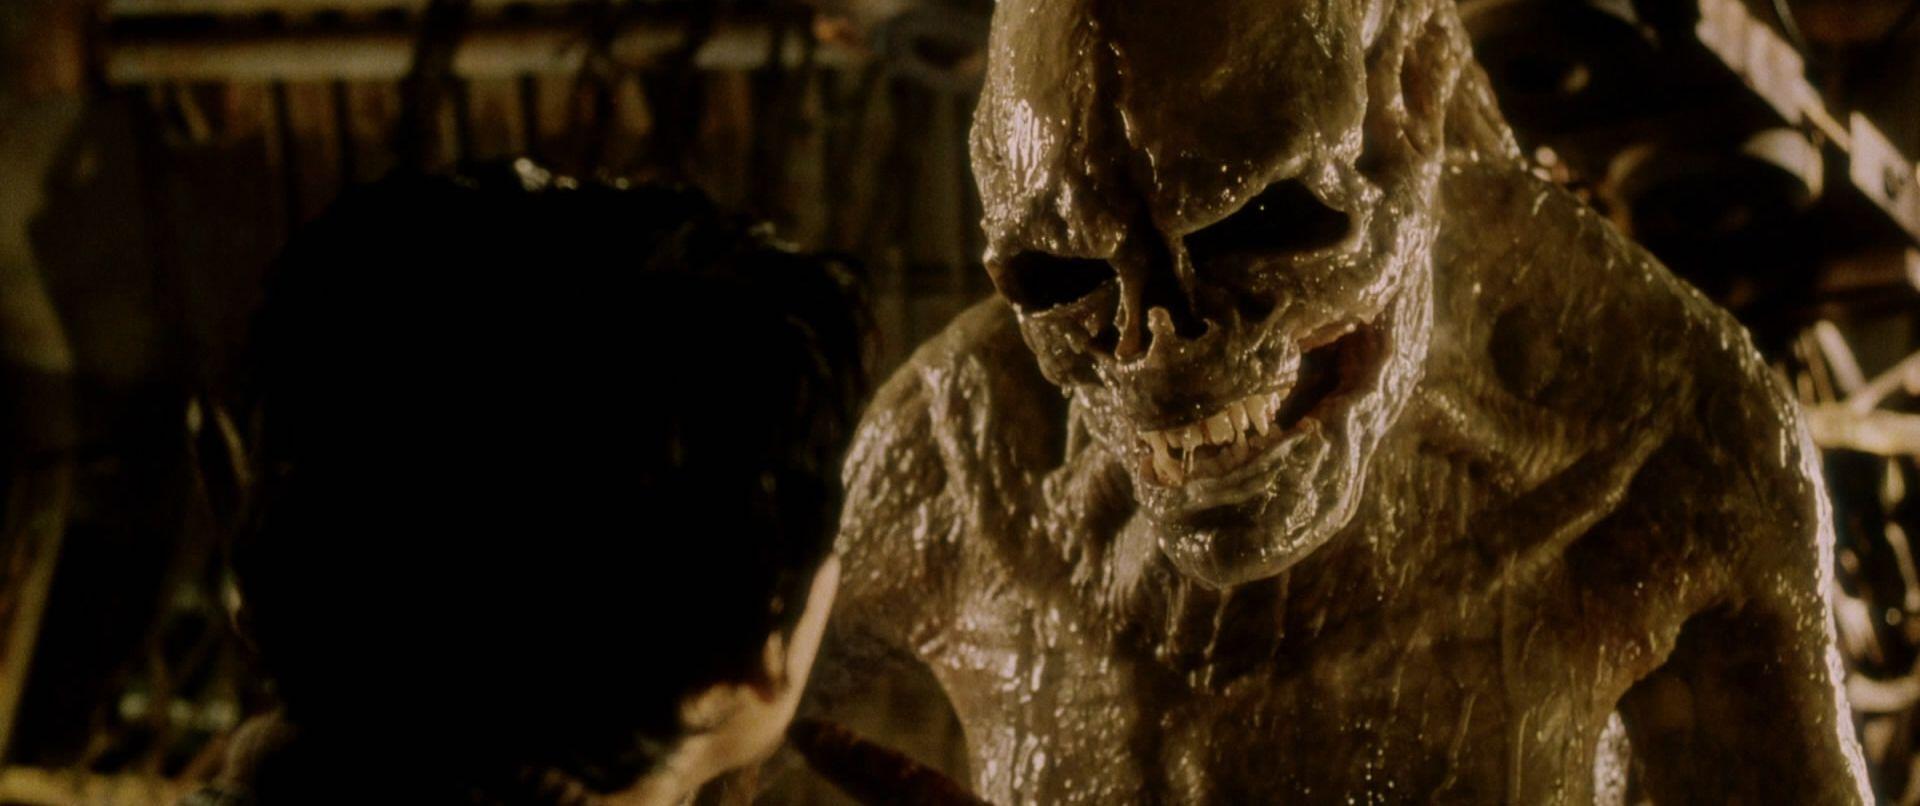 Science Fiction & Horror Alien Resurrection Figure Diversified In Packaging